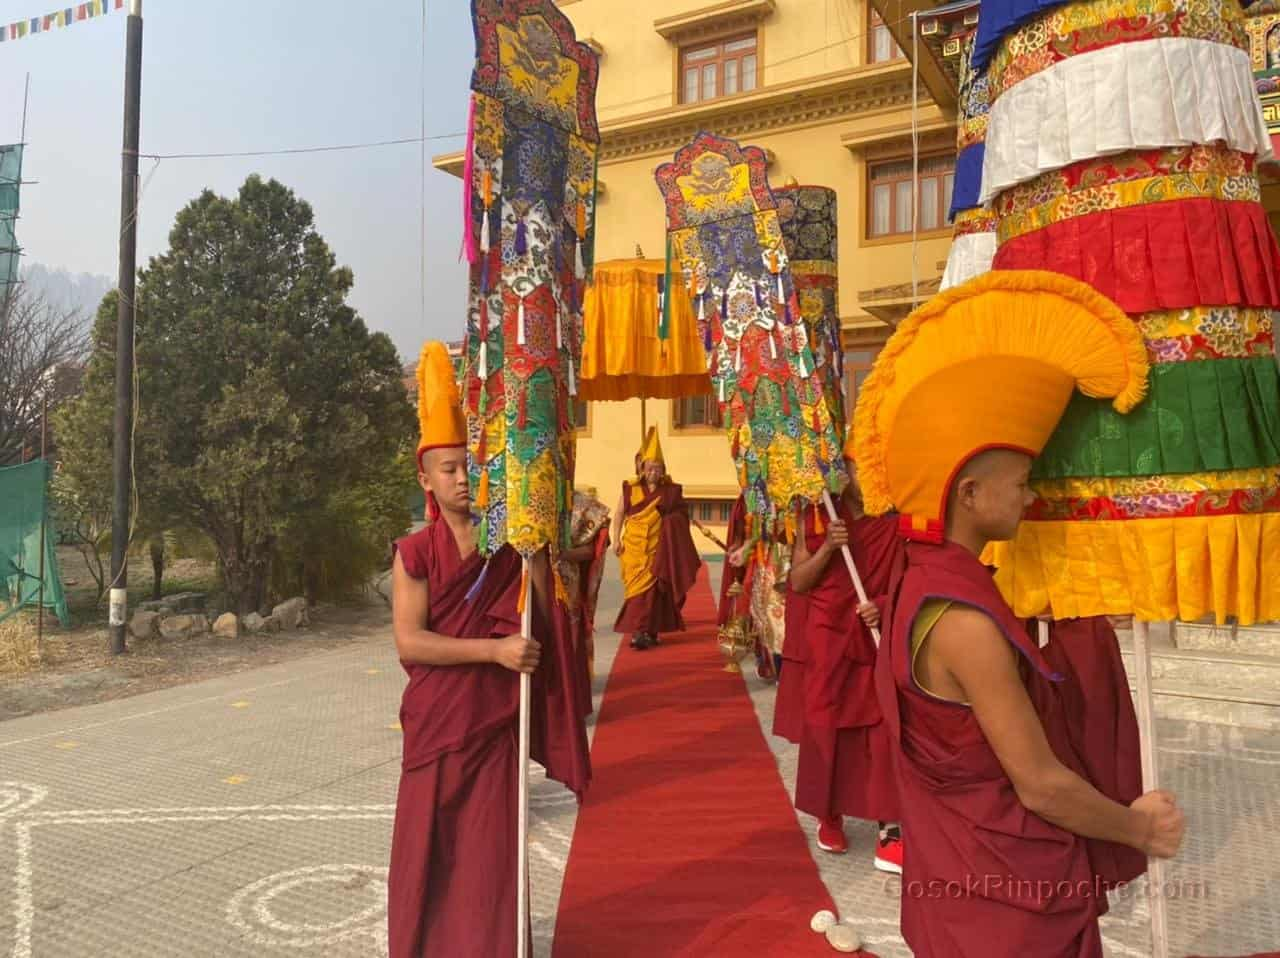 Monlam Chenmo d3 2021-02-26 at 4.31.11 AM